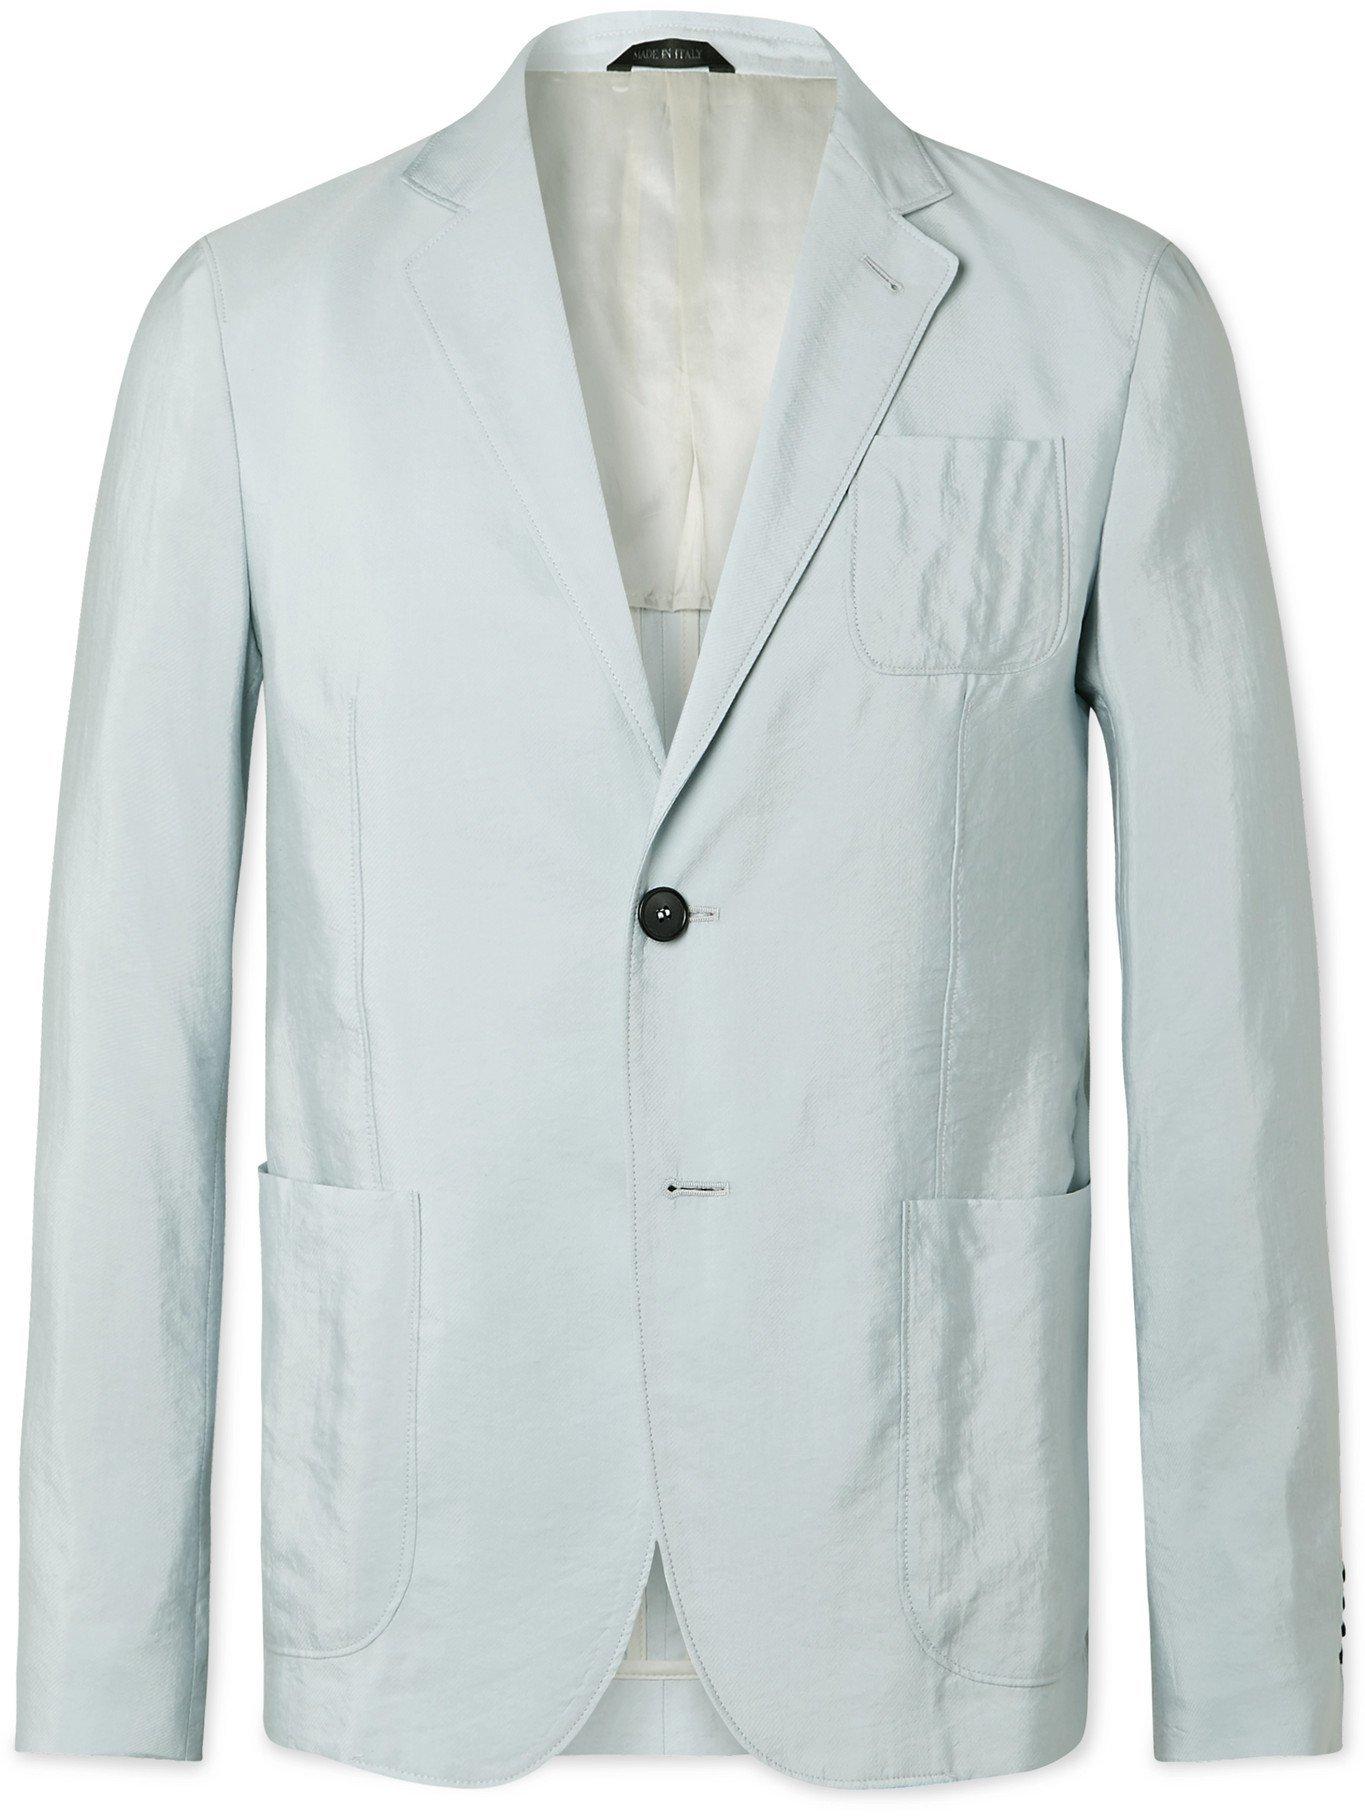 GIORGIO ARMANI - Slim-Fit Silk-Blend Twill Suit Jacket - Blue